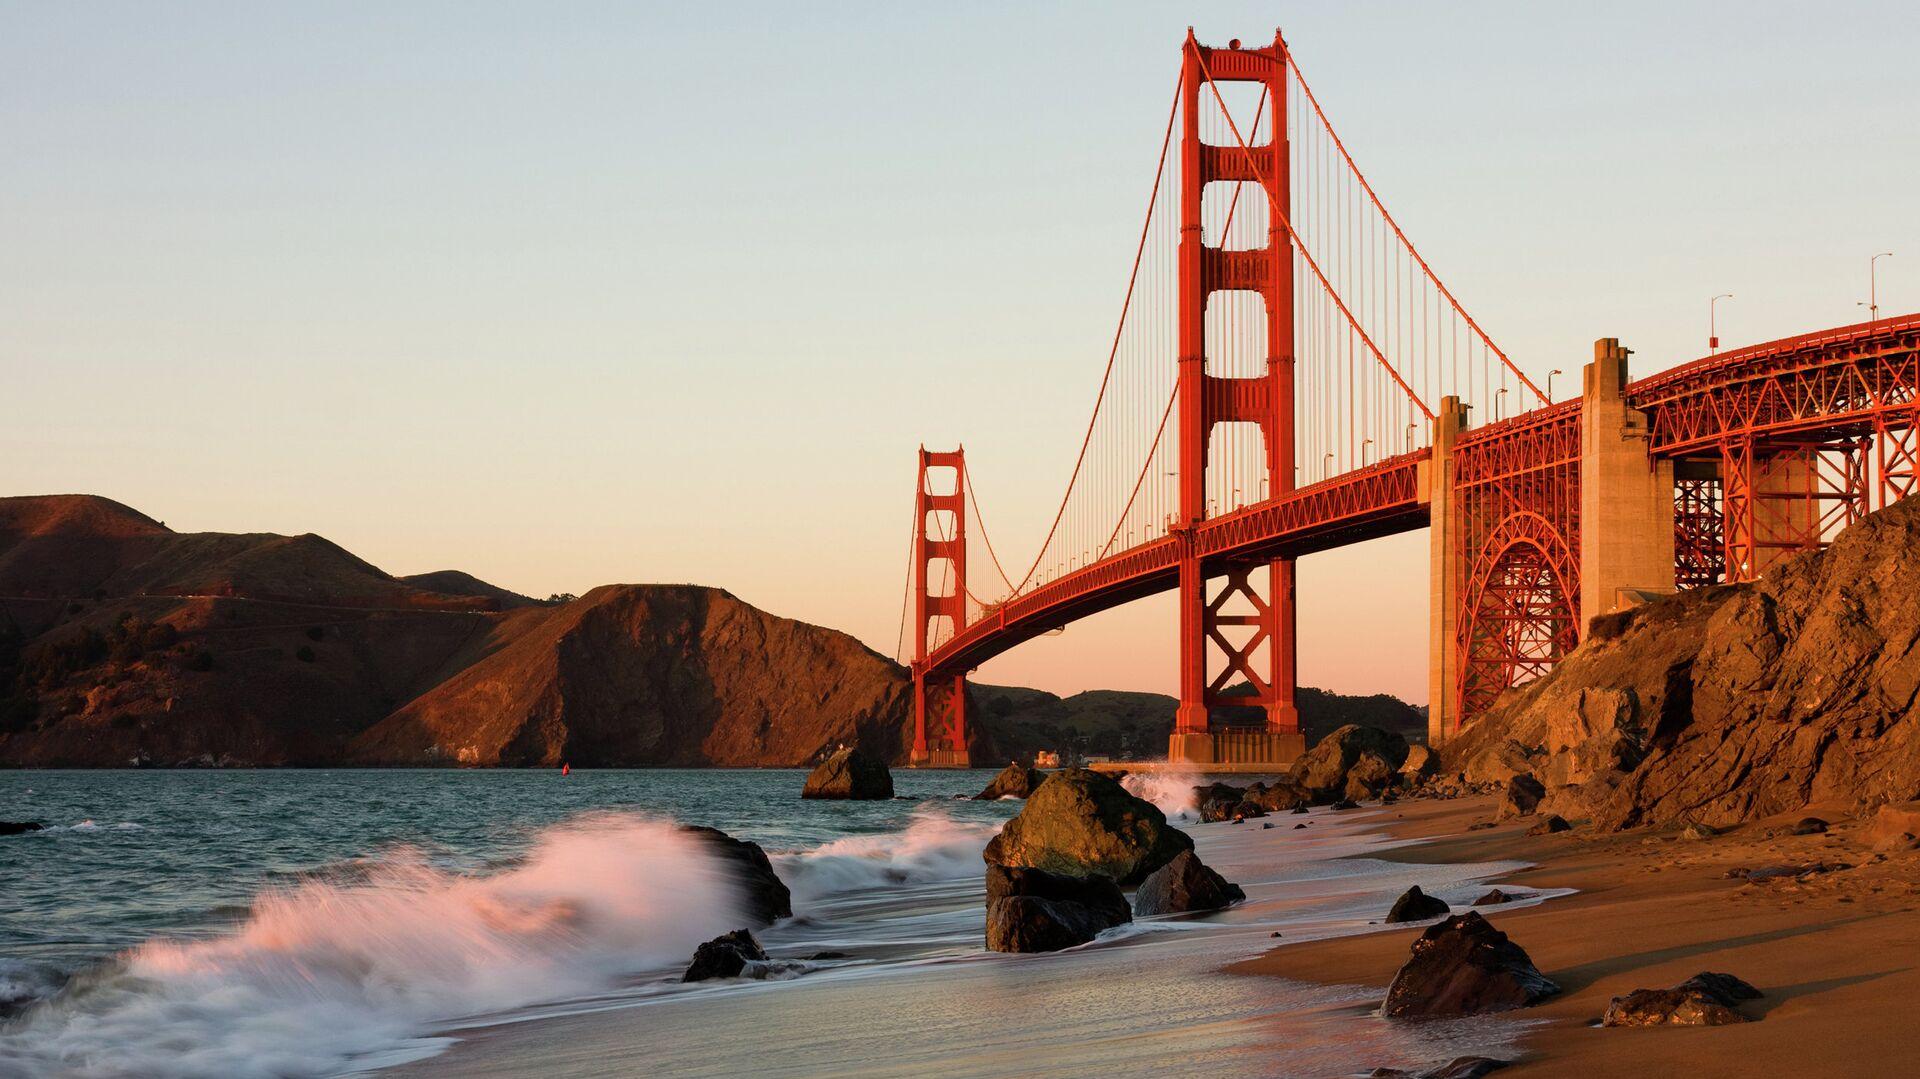 Сан-Франциско, мост Золотые Ворота - РИА Новости, 1920, 10.09.2020